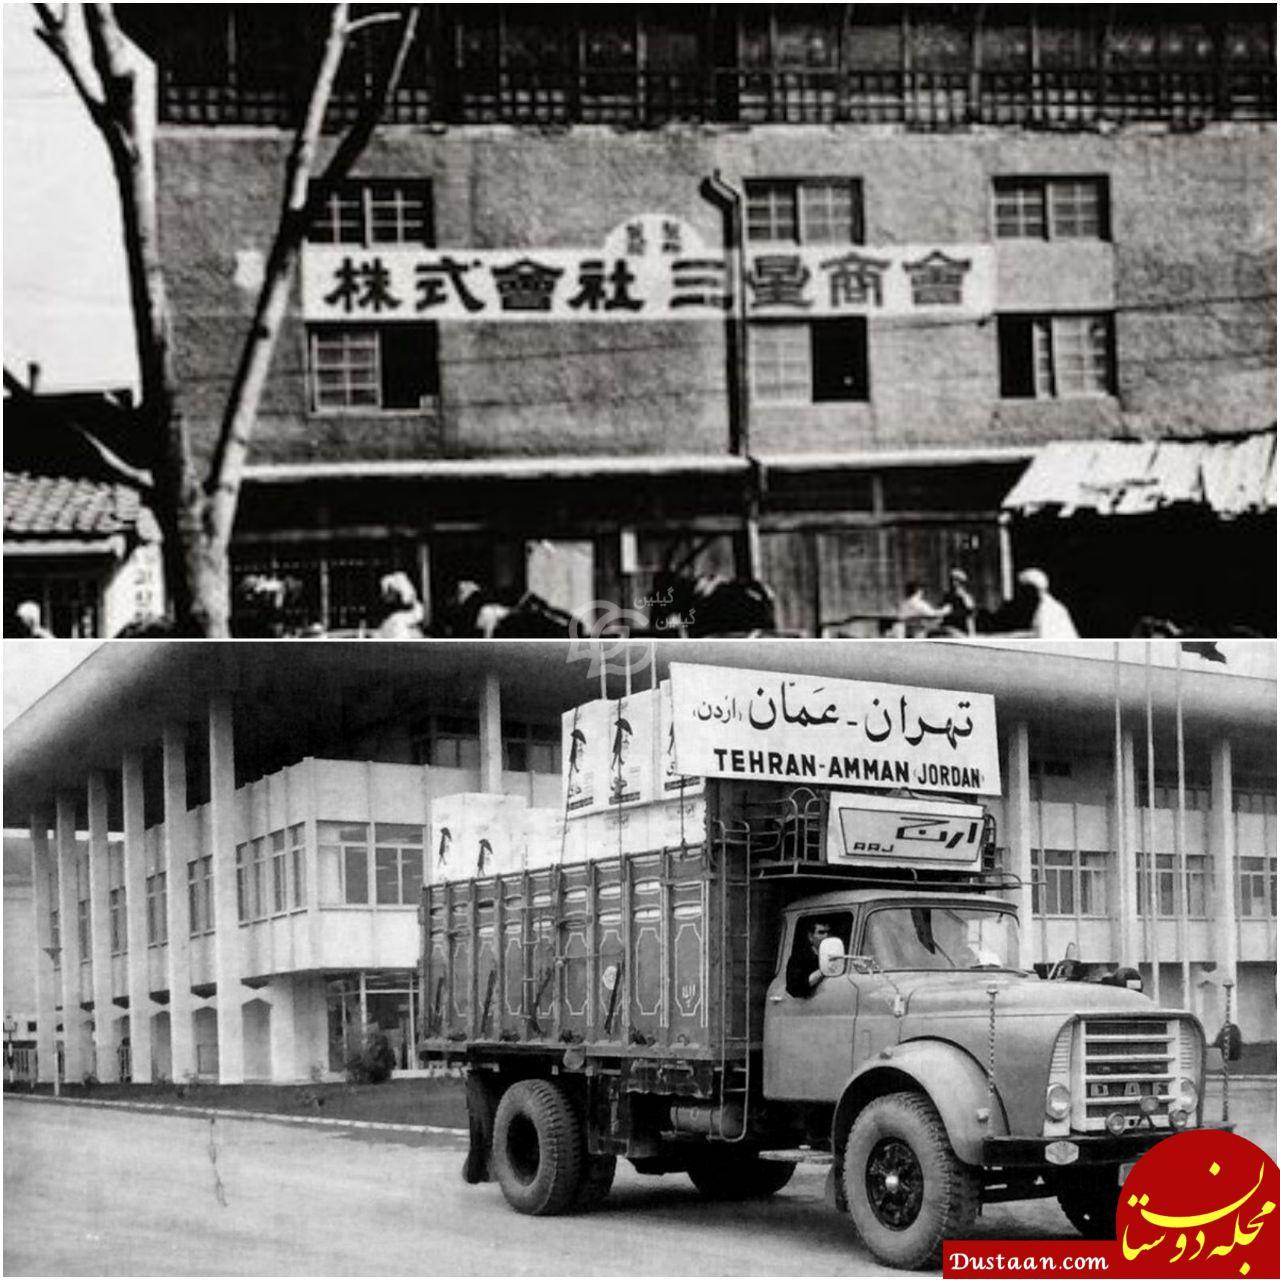 www.dustaan.com تفاوت باورنکردنی شرکت سامسونگ و ارج 80 سال پیش! +عکس